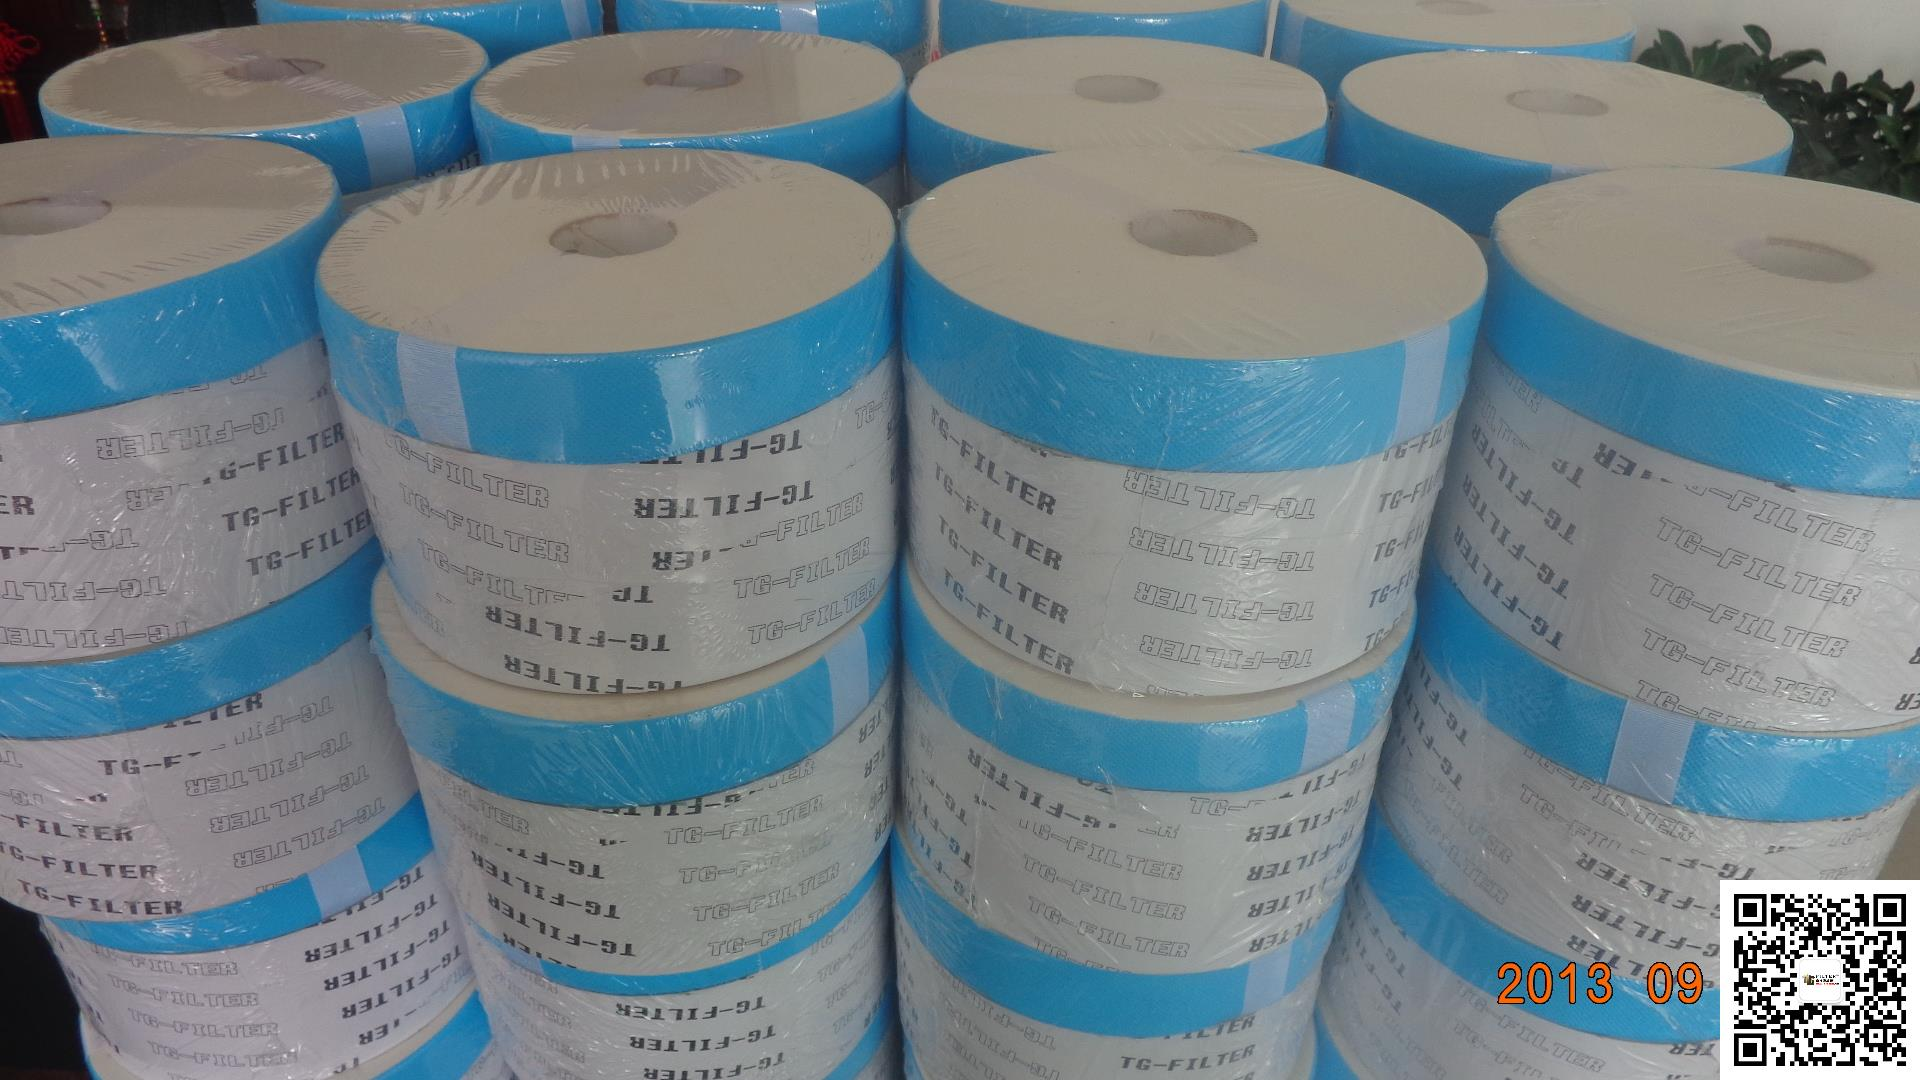 TG-filter滤芯 T100114m超精密滤芯